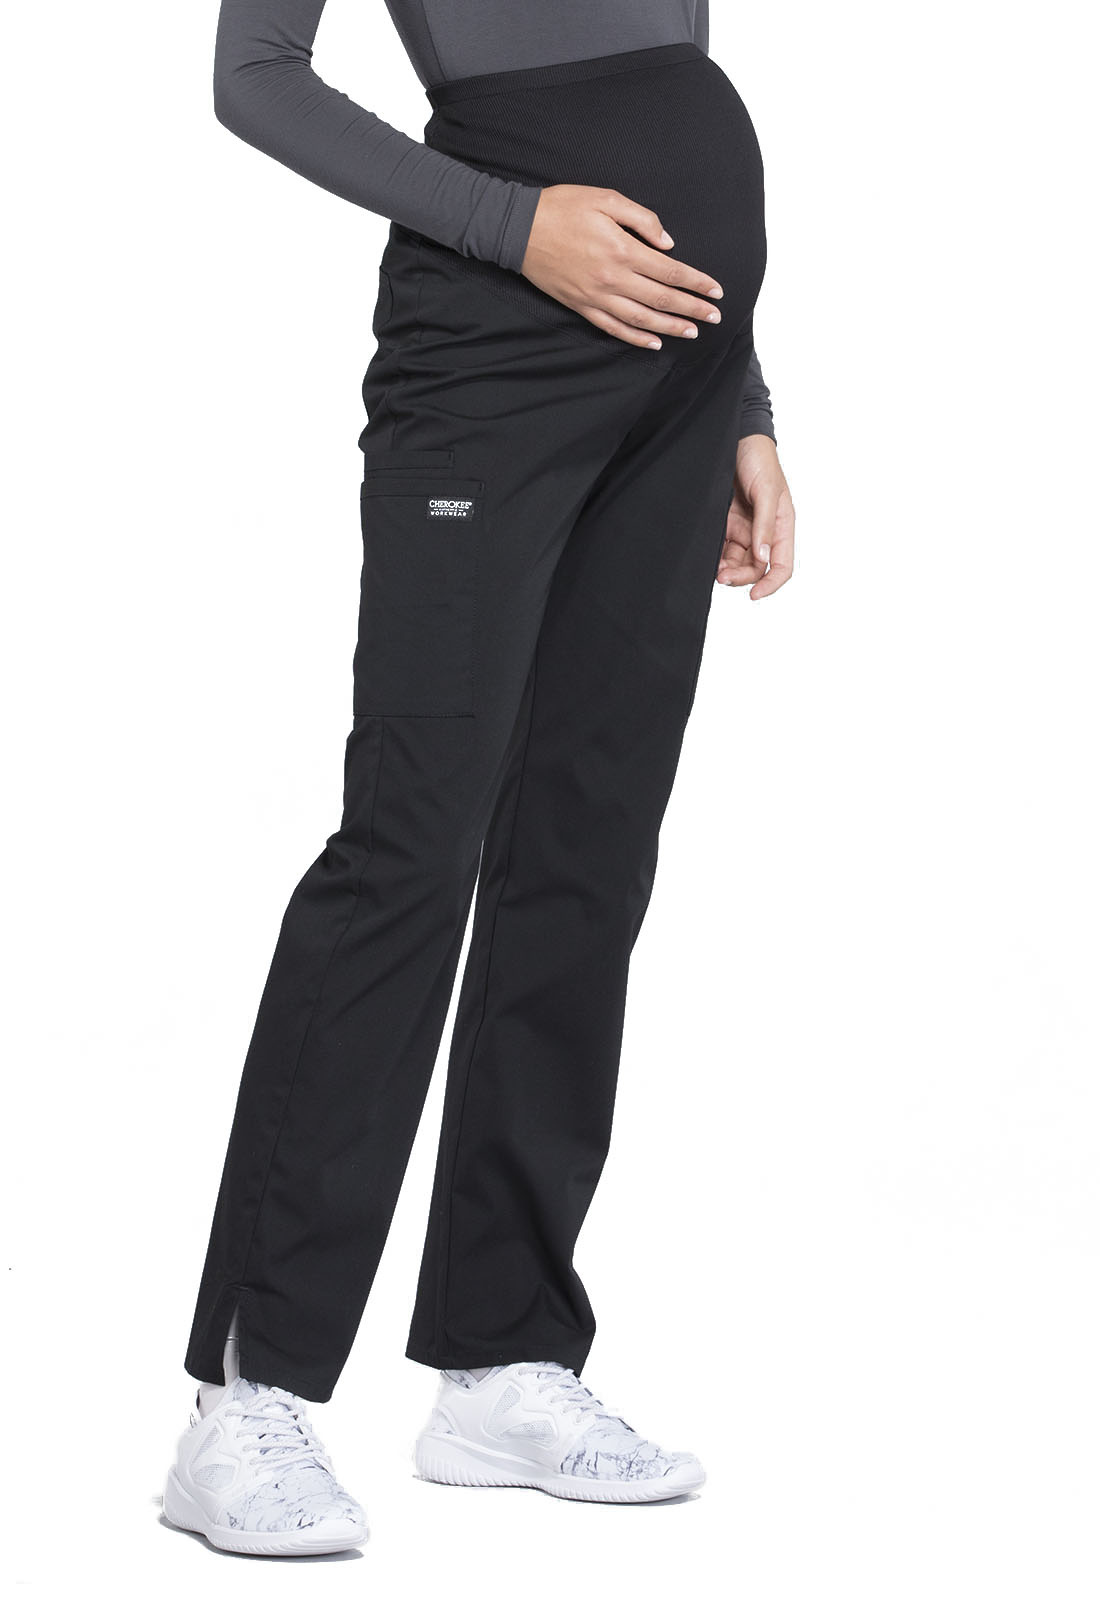 CHEROKEE WORKWEAR Black Maternity Pants 4208